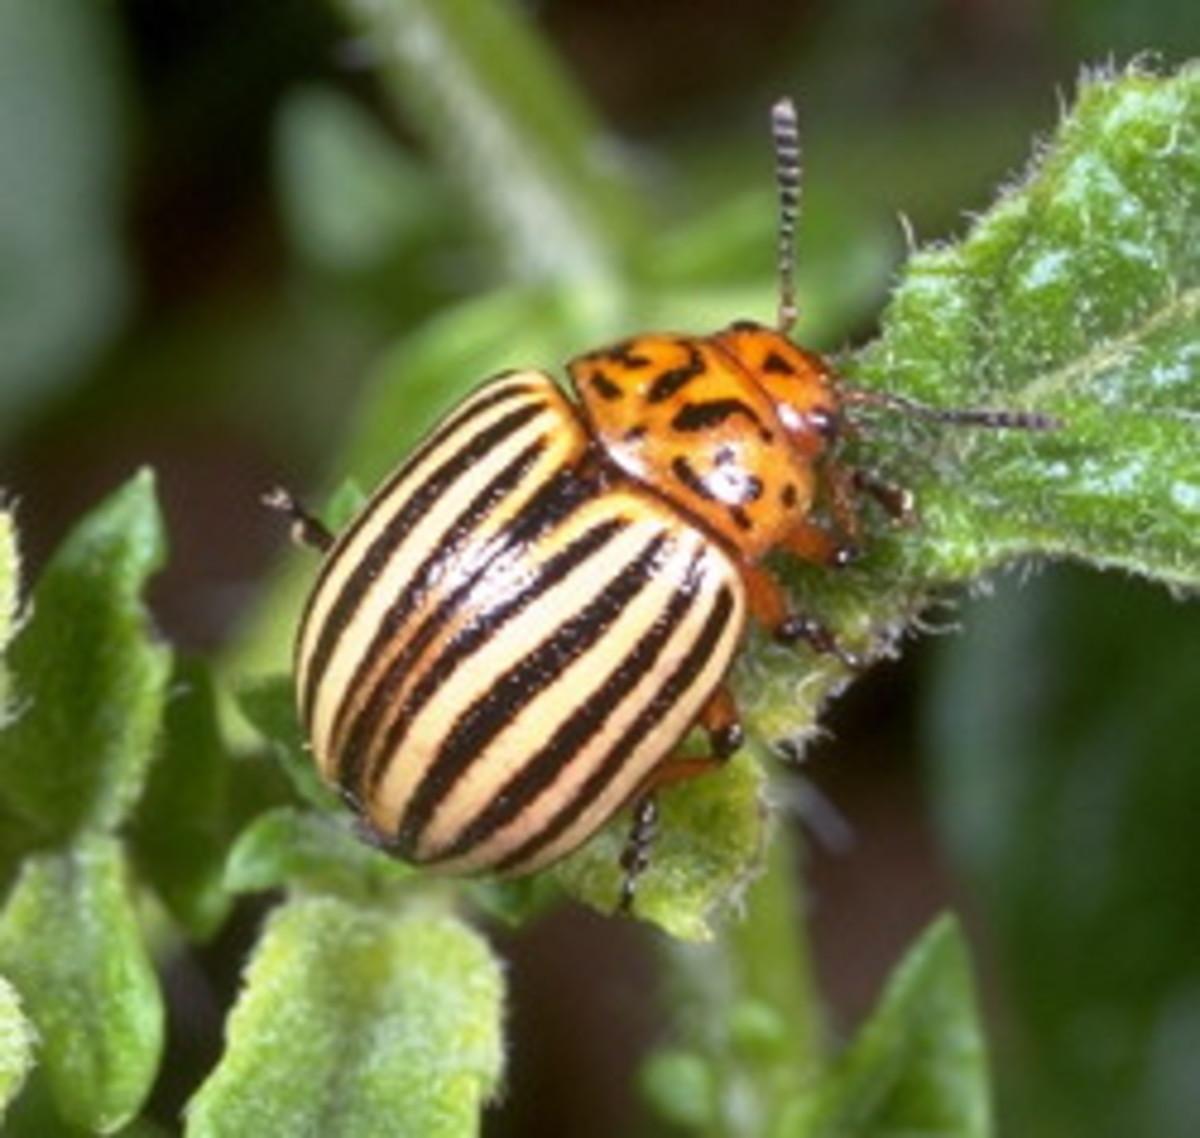 Mature Colorado Potato Beetle